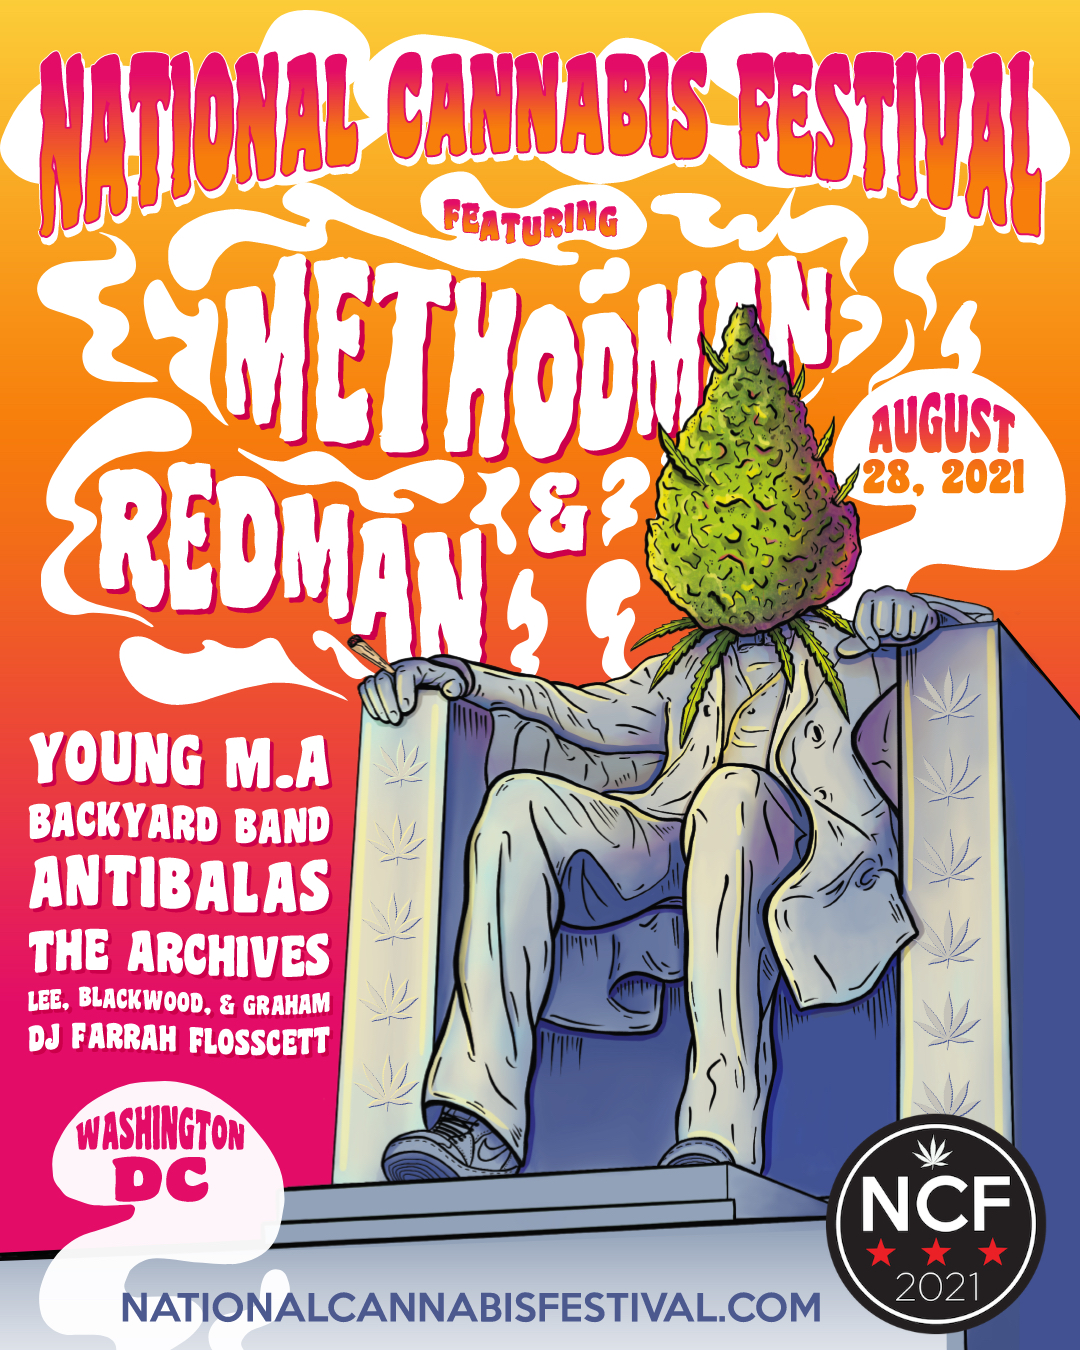 National Cannabis Festival at RFK